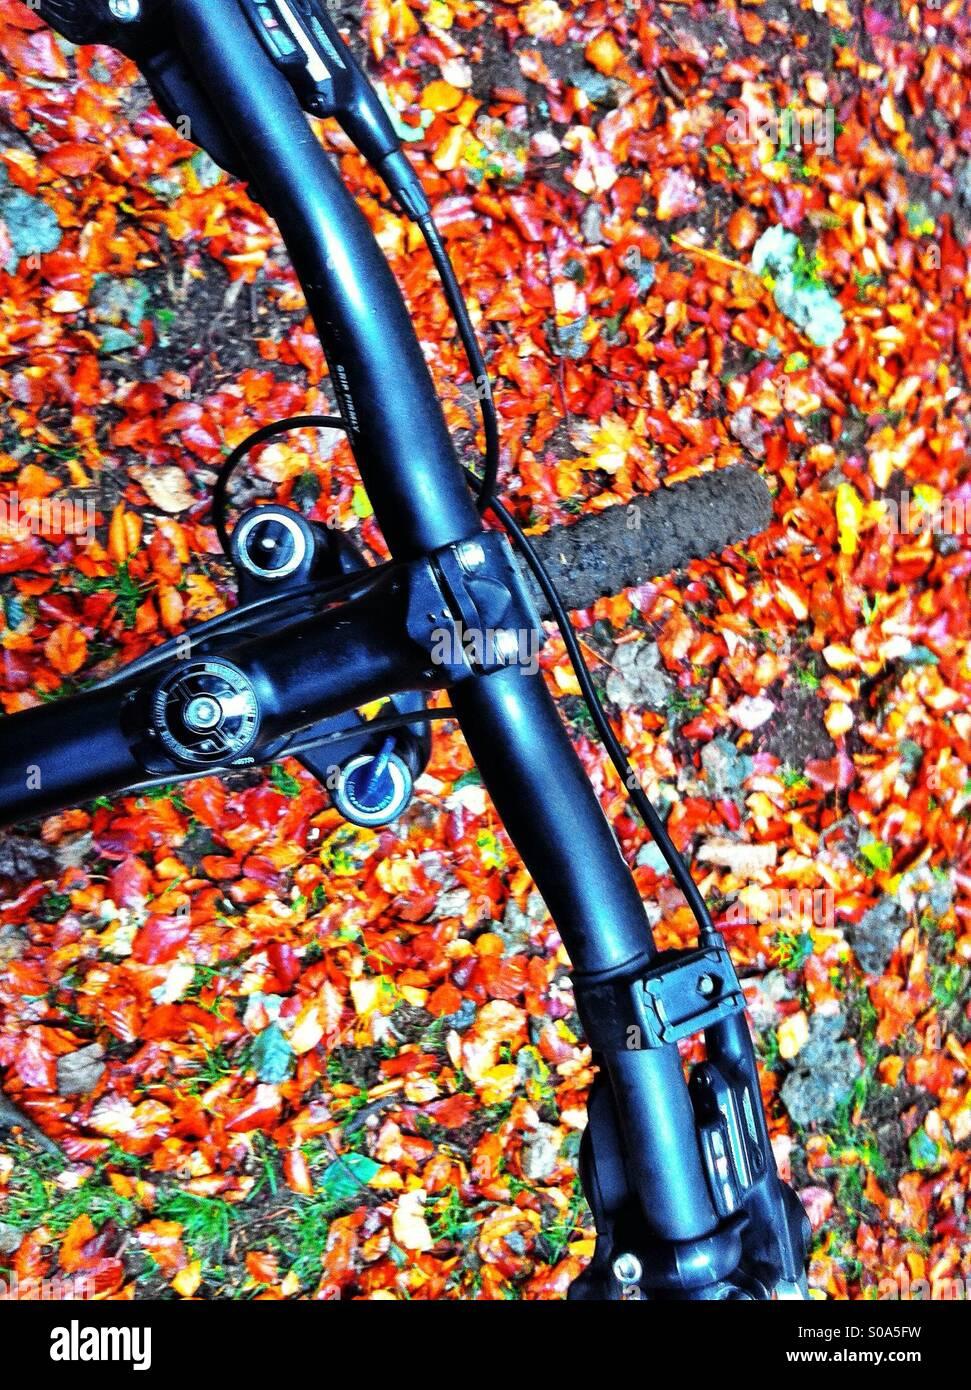 Overhead shot of mountain bike handlebars and autumn leaves on ground. - Stock Image